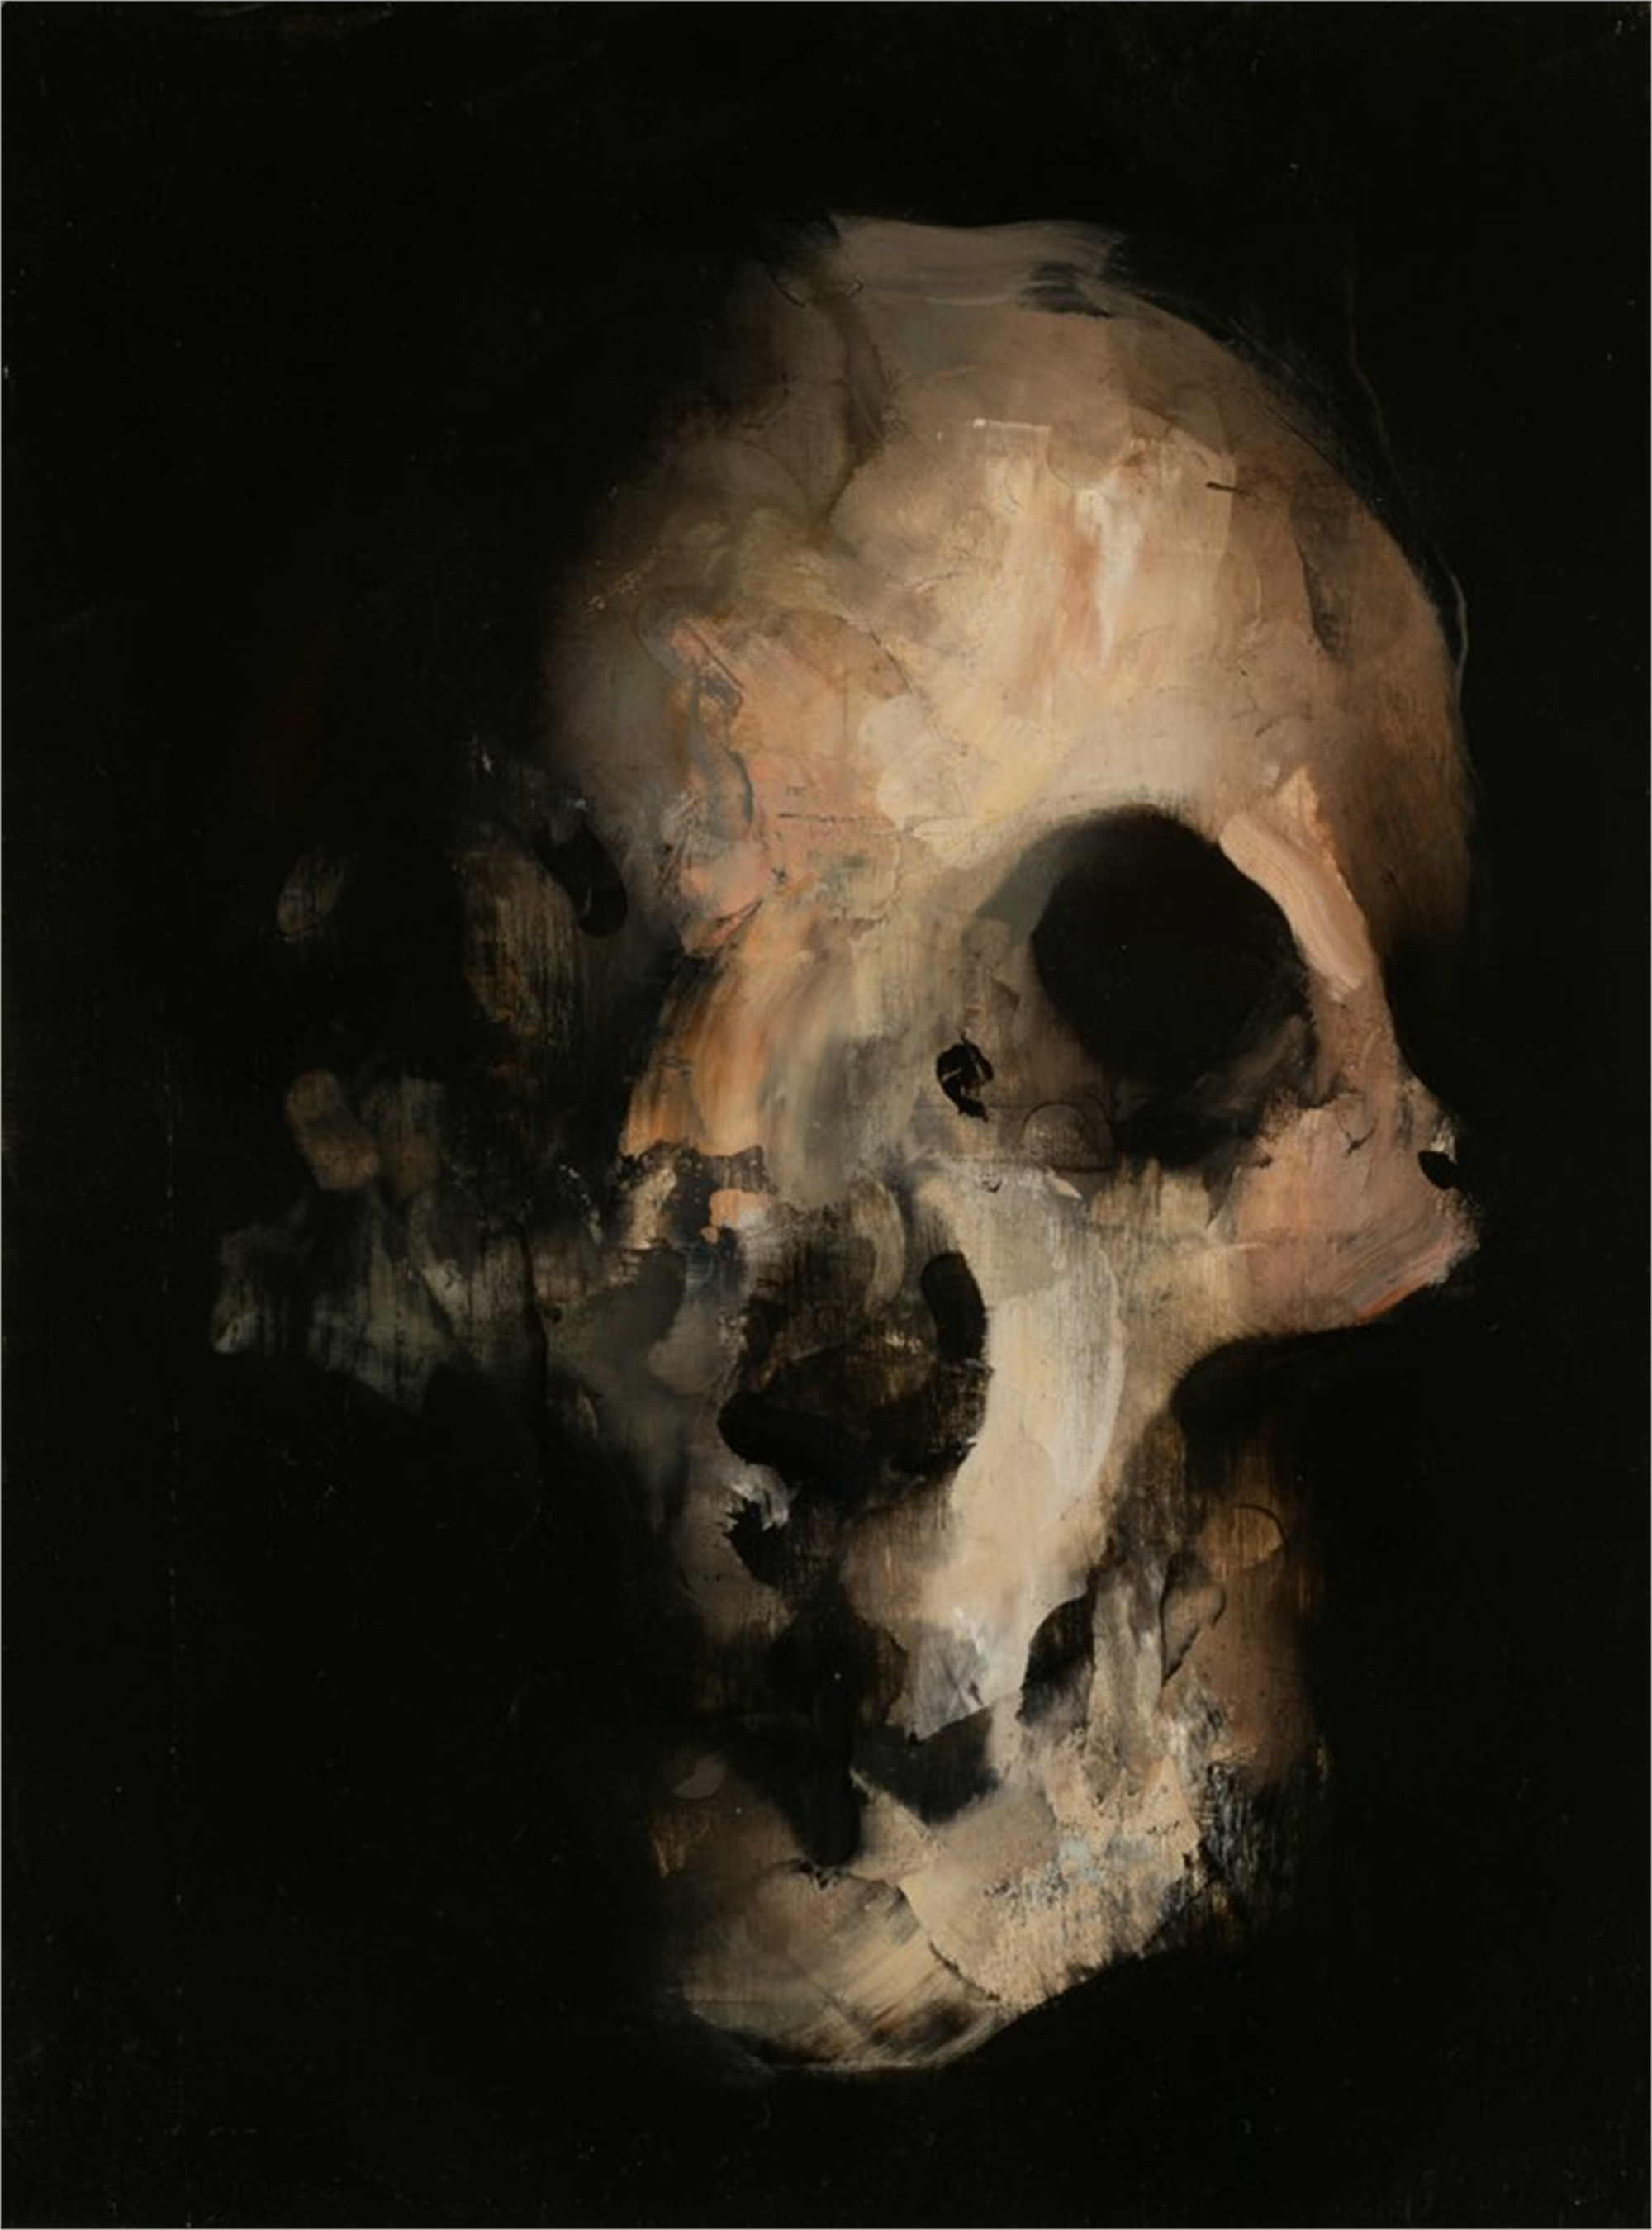 Danse Macabre by Matthew Saba